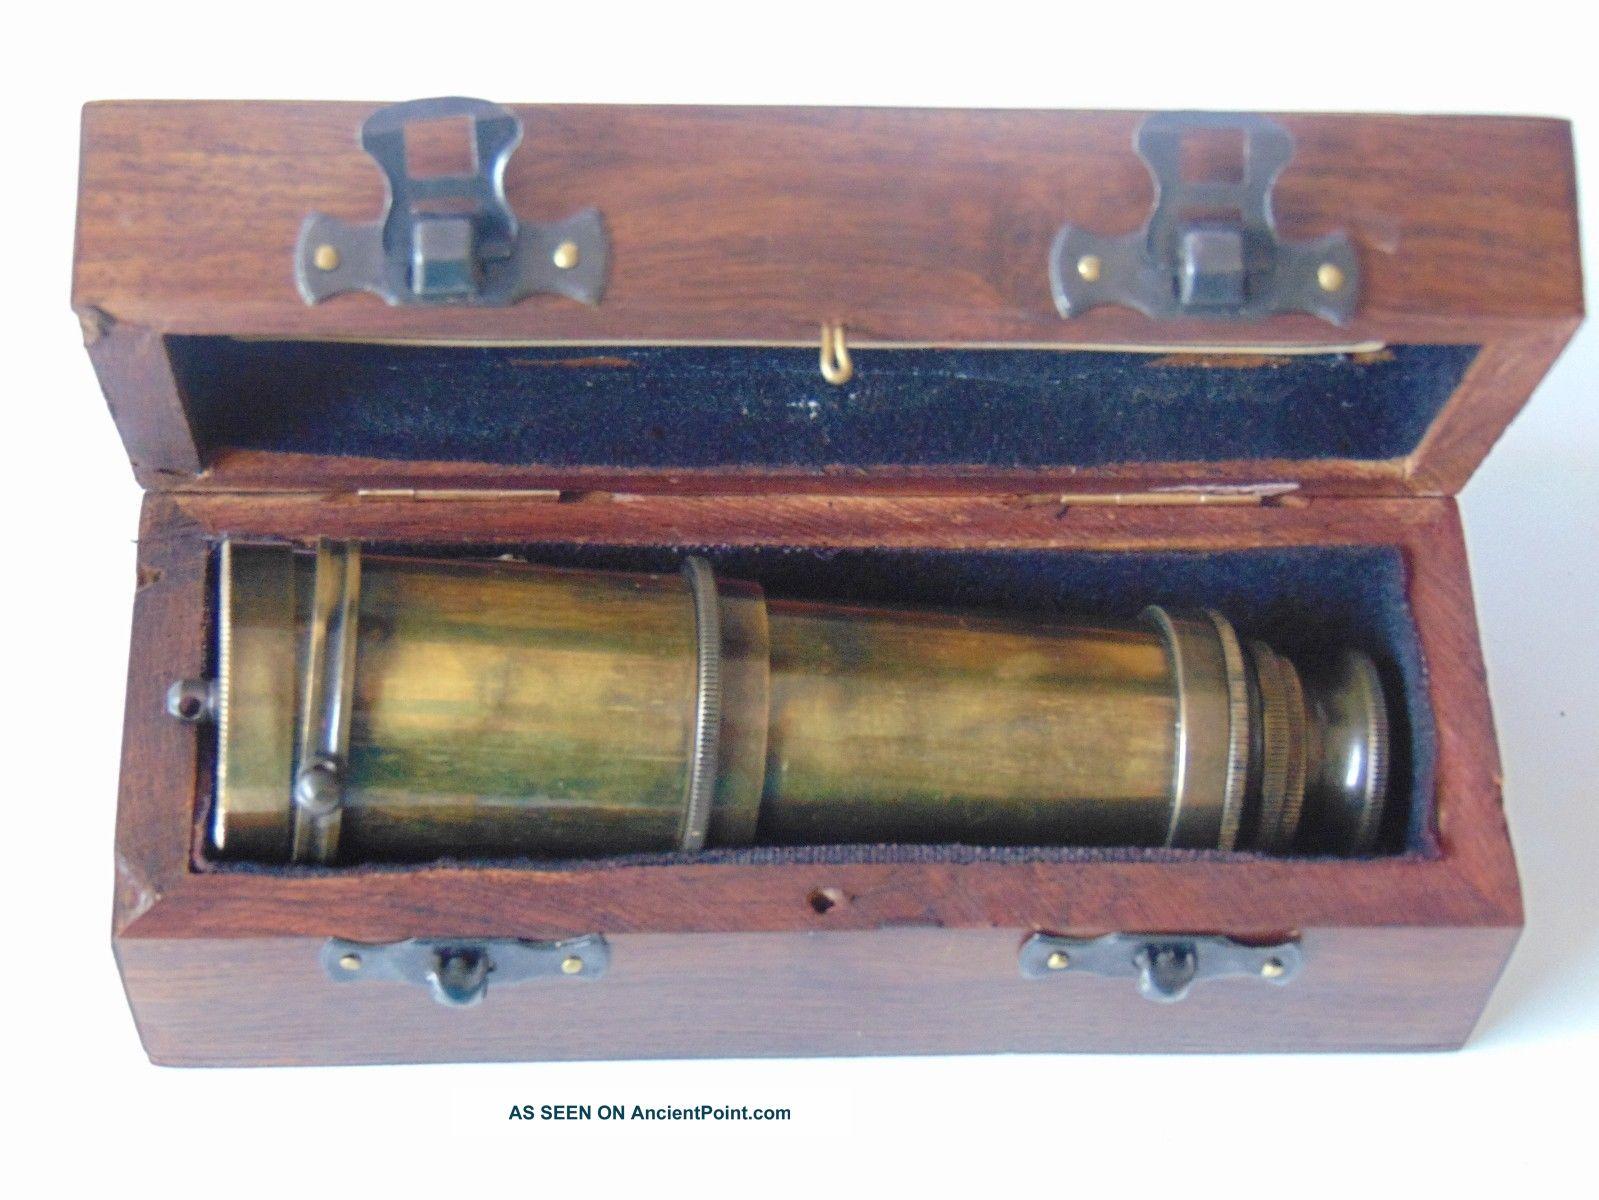 Brass Antique Nautical Vintage Telescope - Handheld Telescope With Wooden Box Telescopes photo